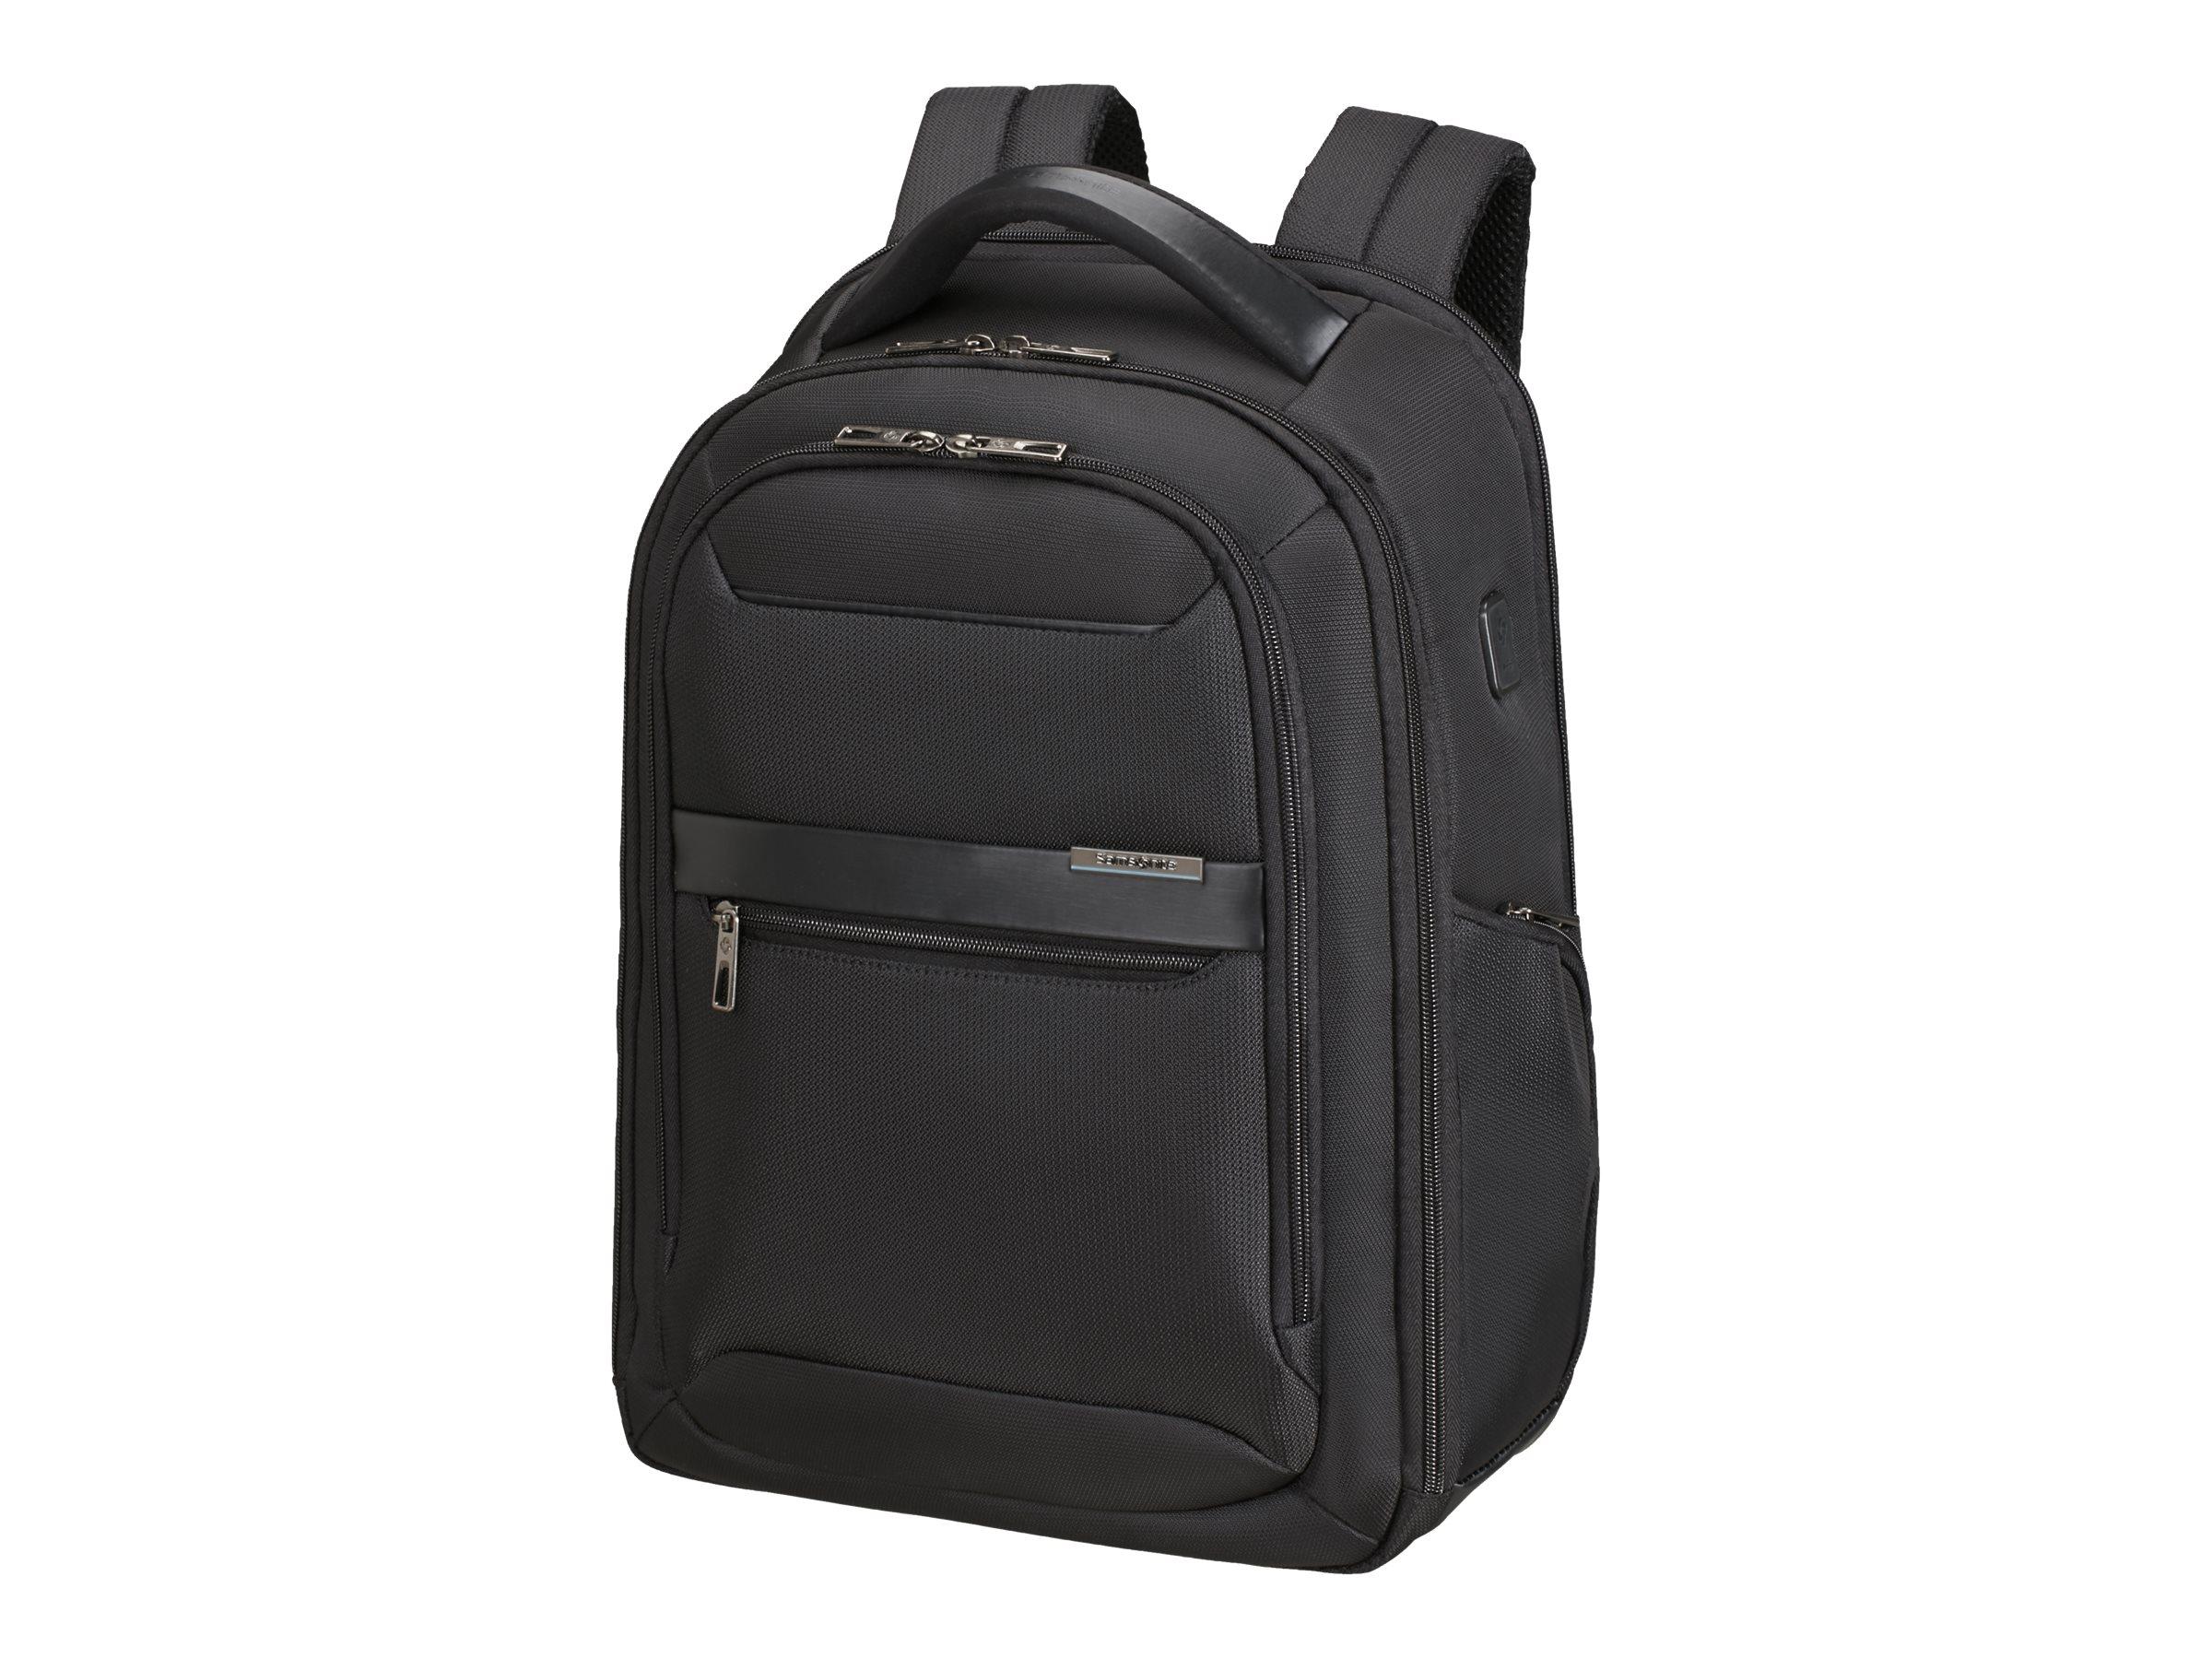 Samsonite Vectura EVO Laptop Backpack - Notebook-Rucksack - 39.6 cm (15.6